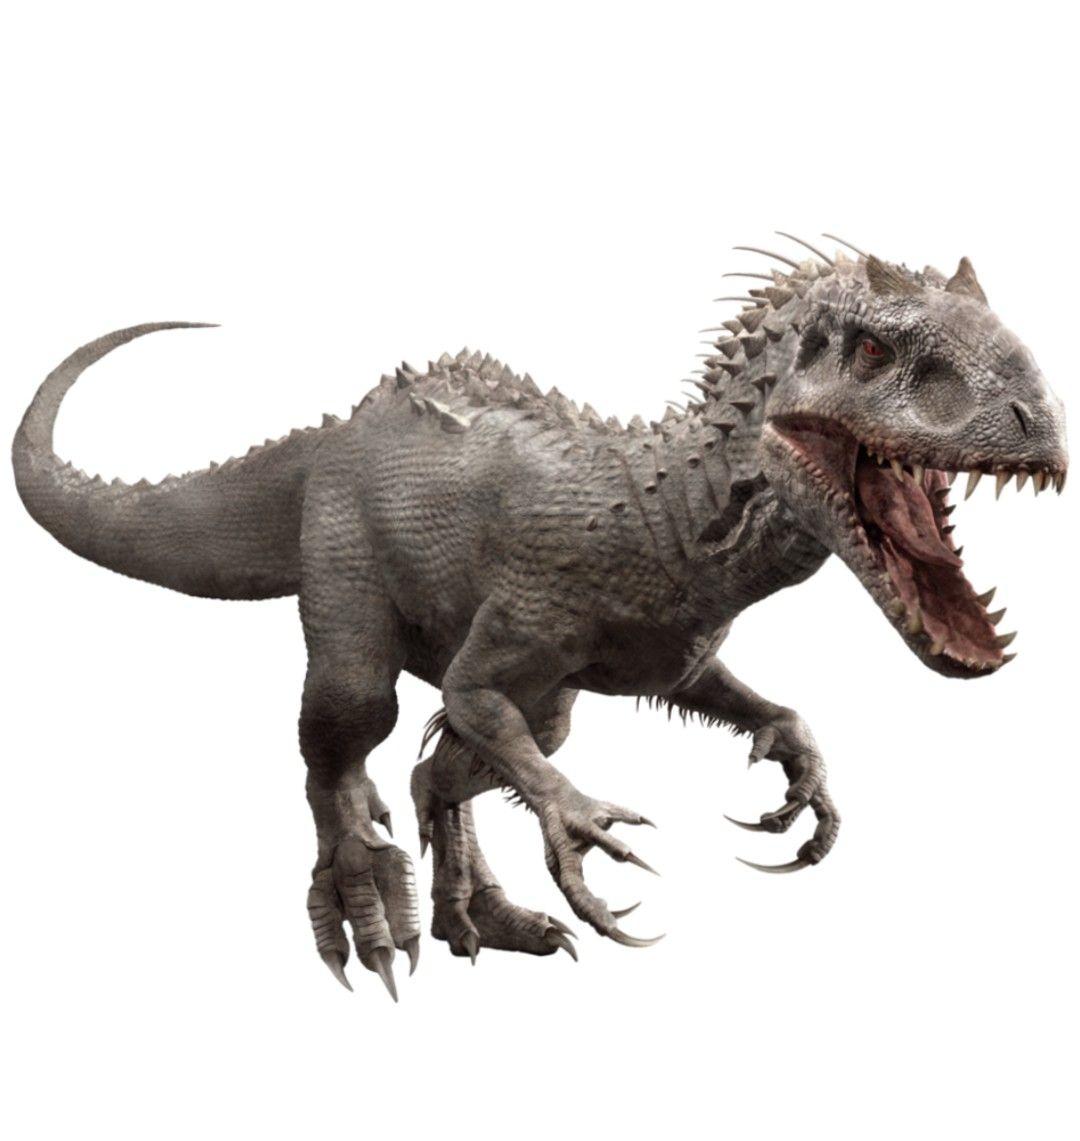 Pin Oleh David Tioc Di Jurassic Park World Dinosaurs Hewan Gambar Hewan Binatang Si ya lo estáis jugando, puede que os ahora ya sabéis cómo vender dinosaurios en jurassic world evolution para ps4, xbox one y pc. pin oleh david tioc di jurassic park